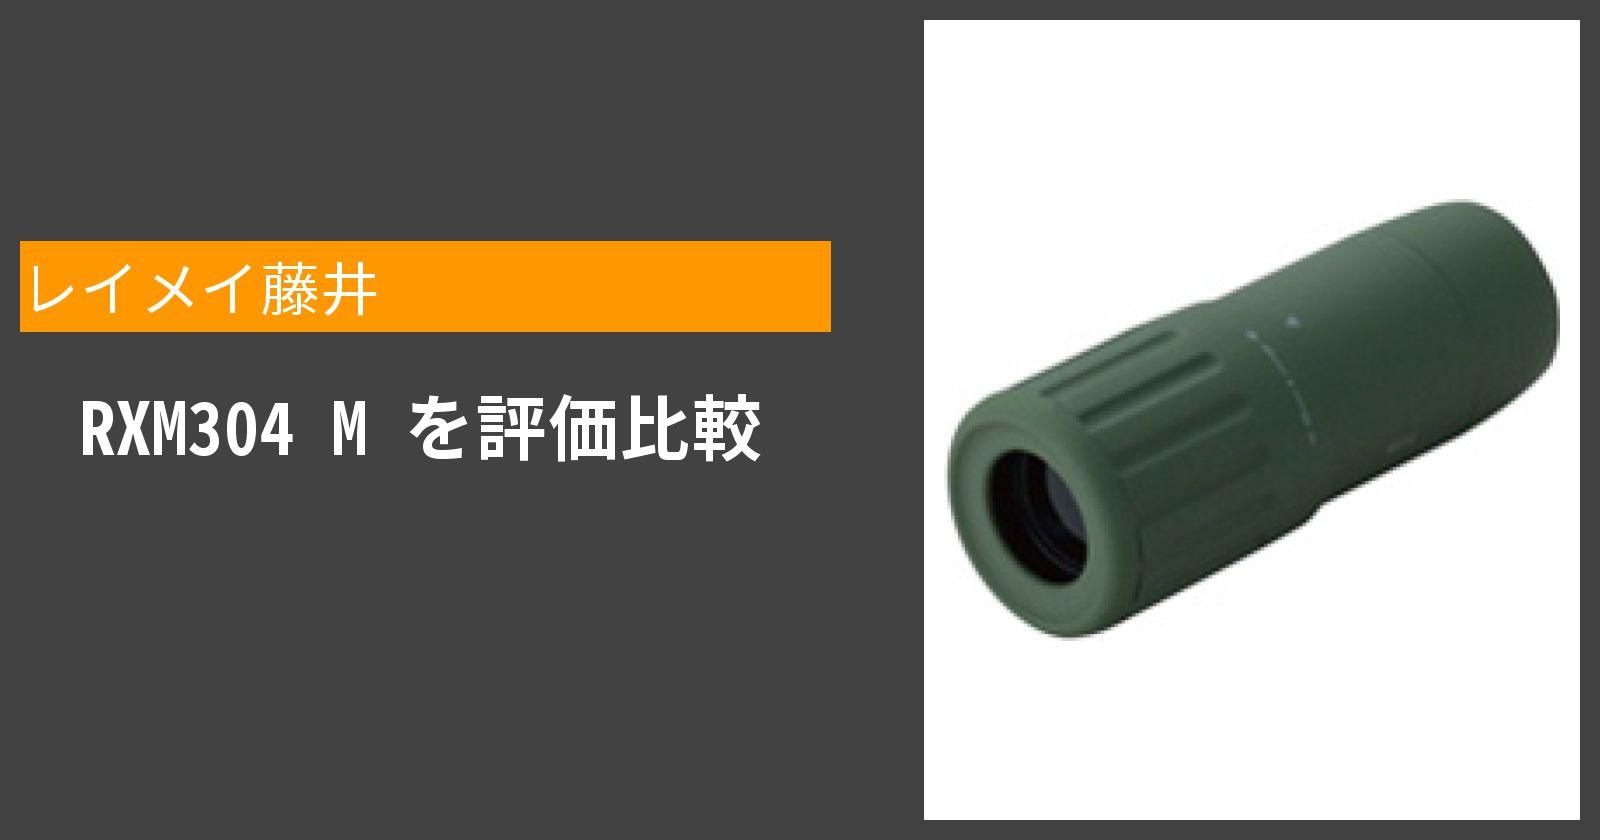 RXM304 Mを徹底評価